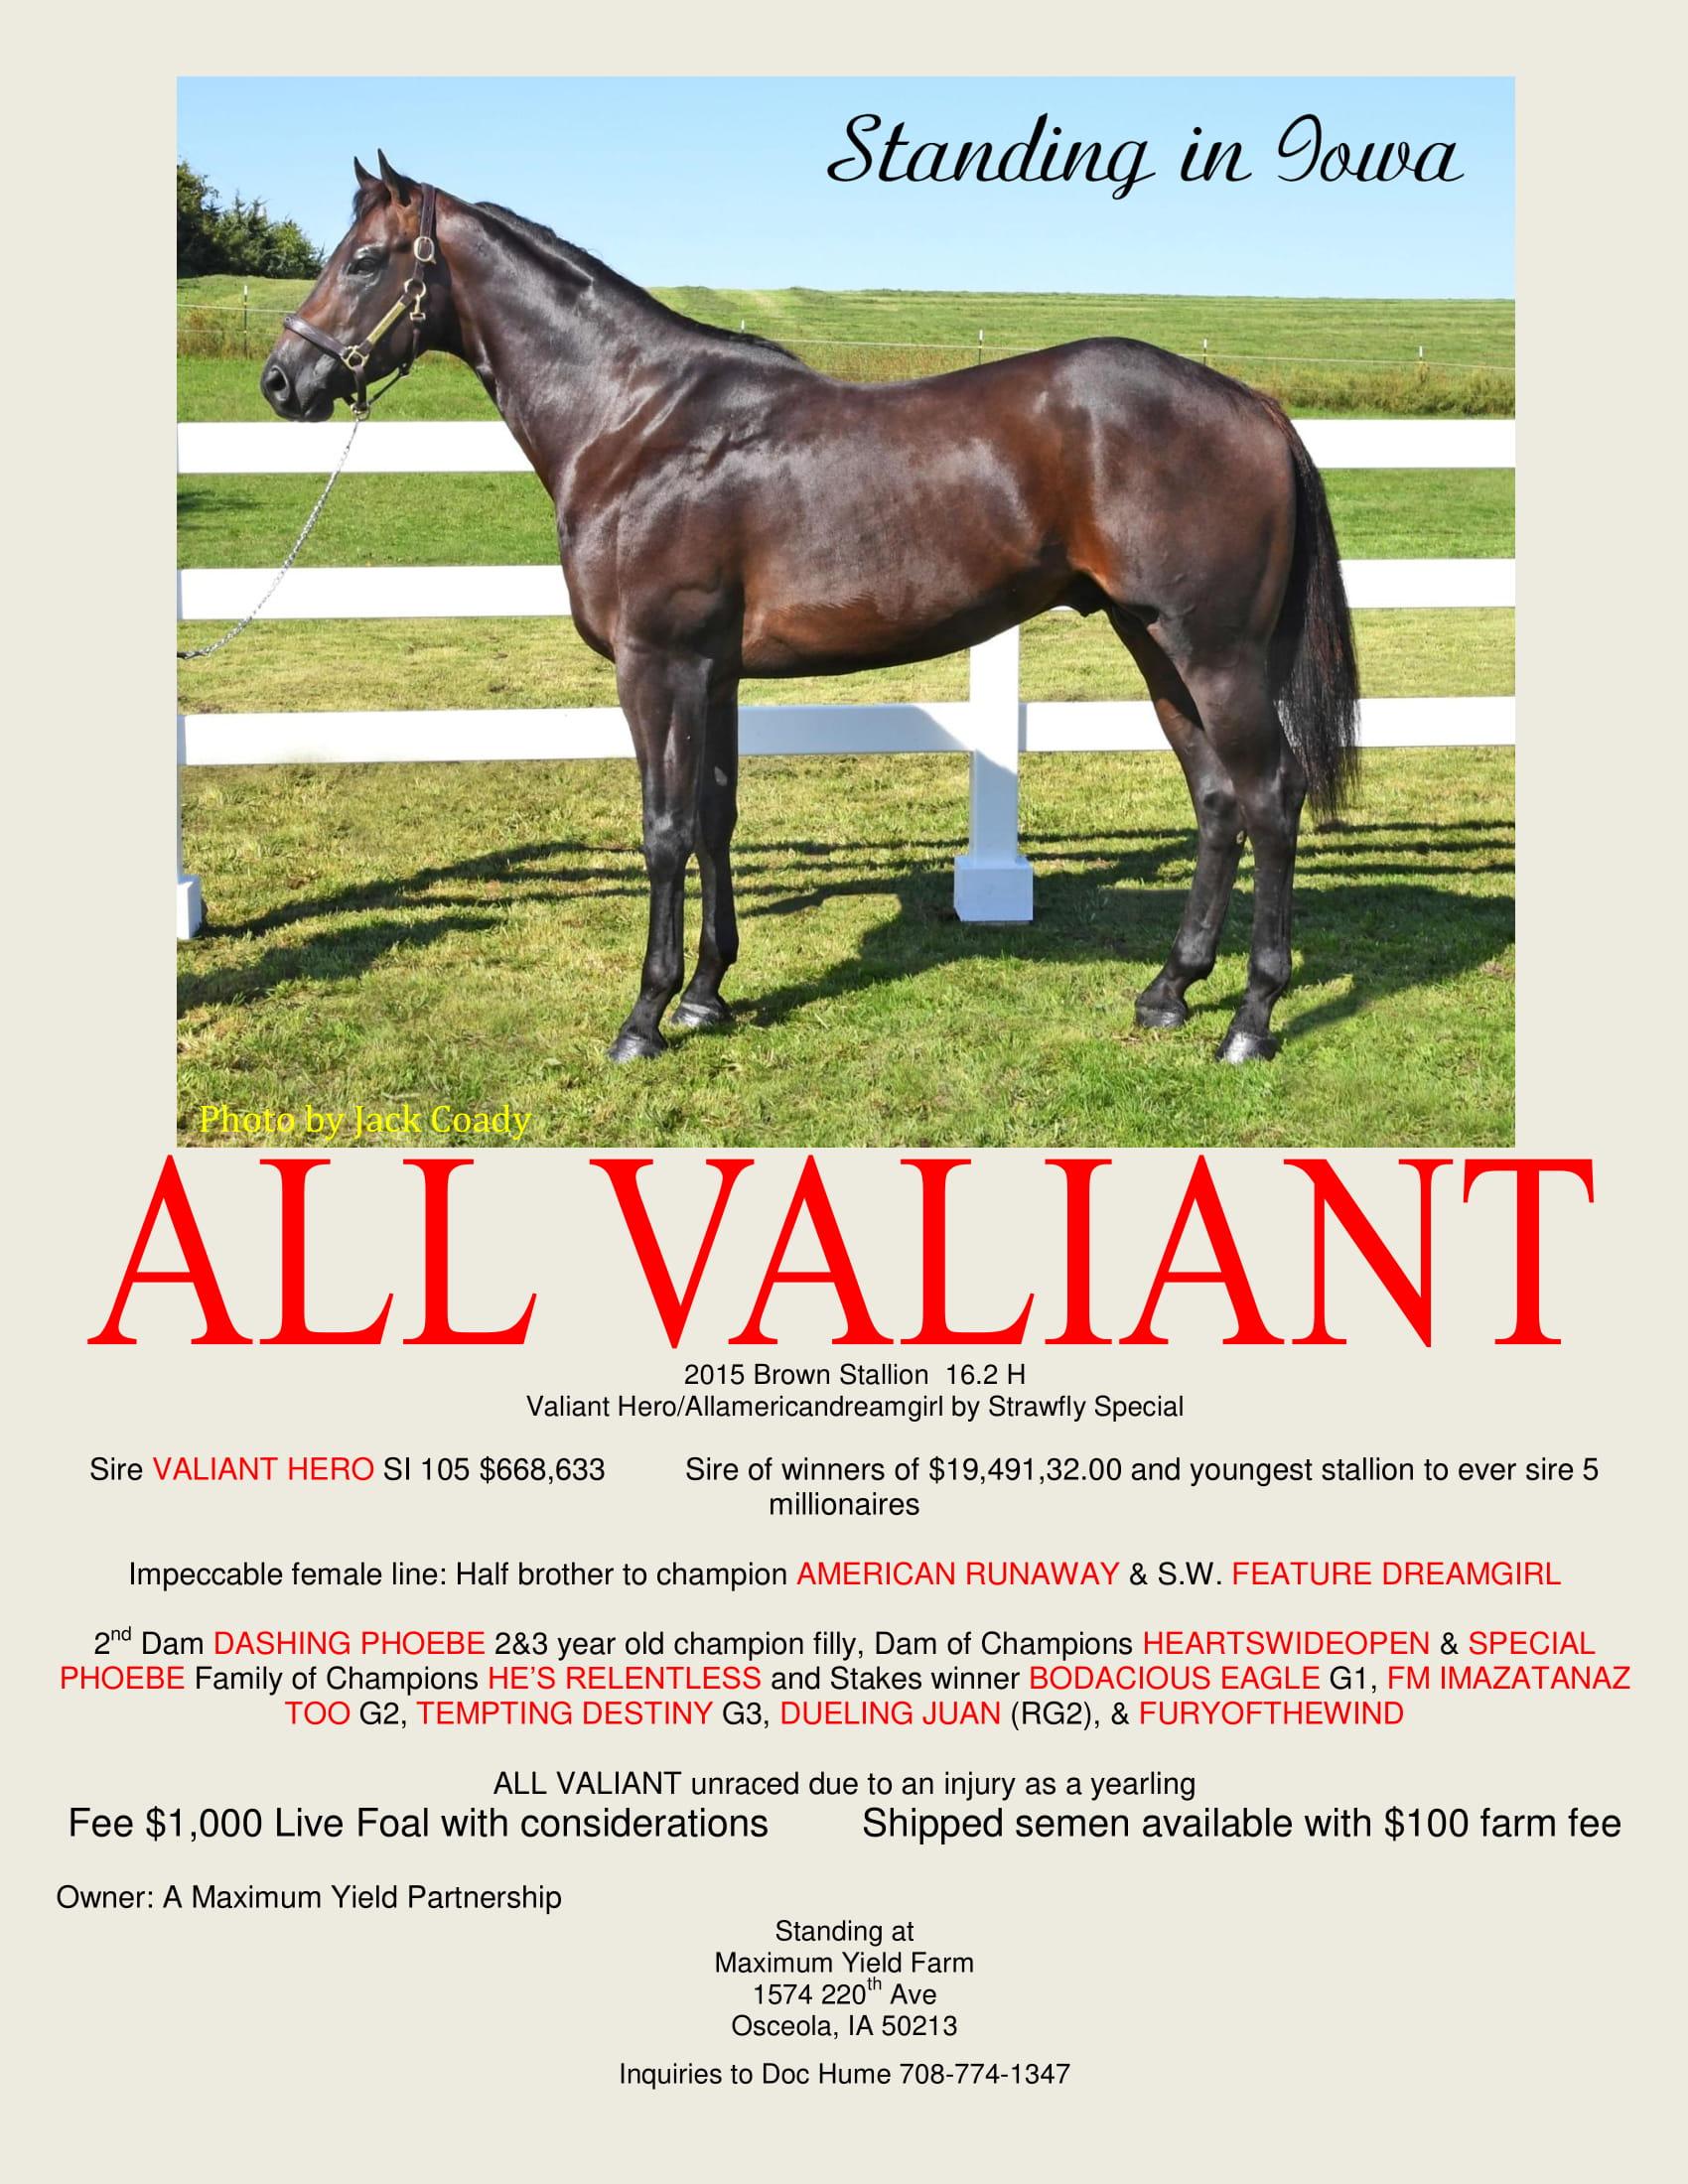 All Valiant